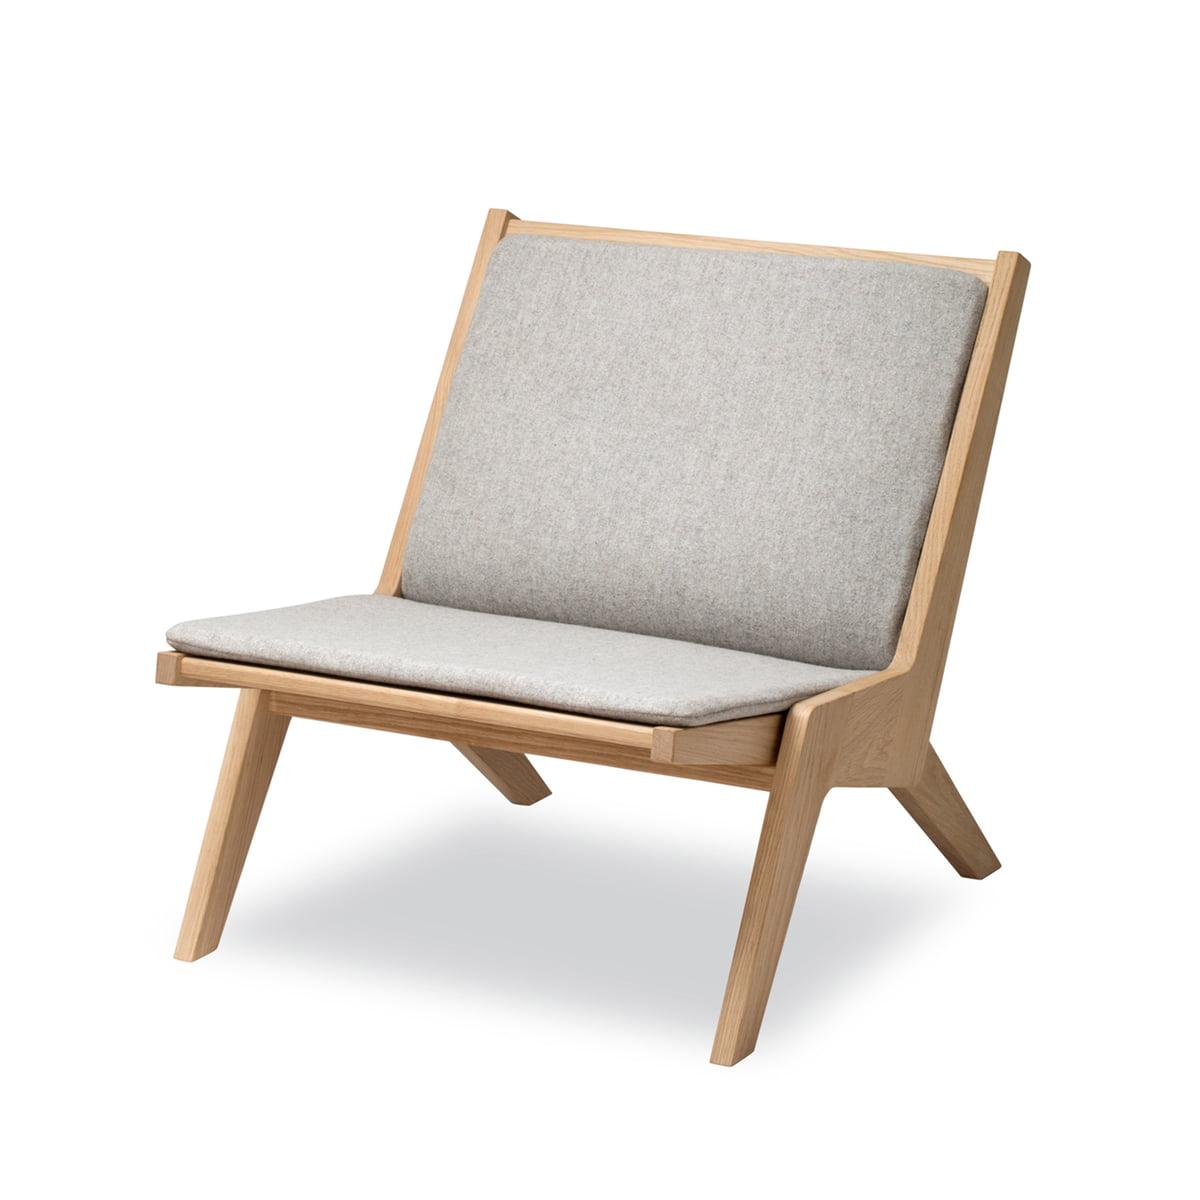 Skagerak - Miskito Lounge Chair, Eiche / hellgrau | Wohnzimmer > Sessel > Loungesessel | Hellgrau | Skagerak